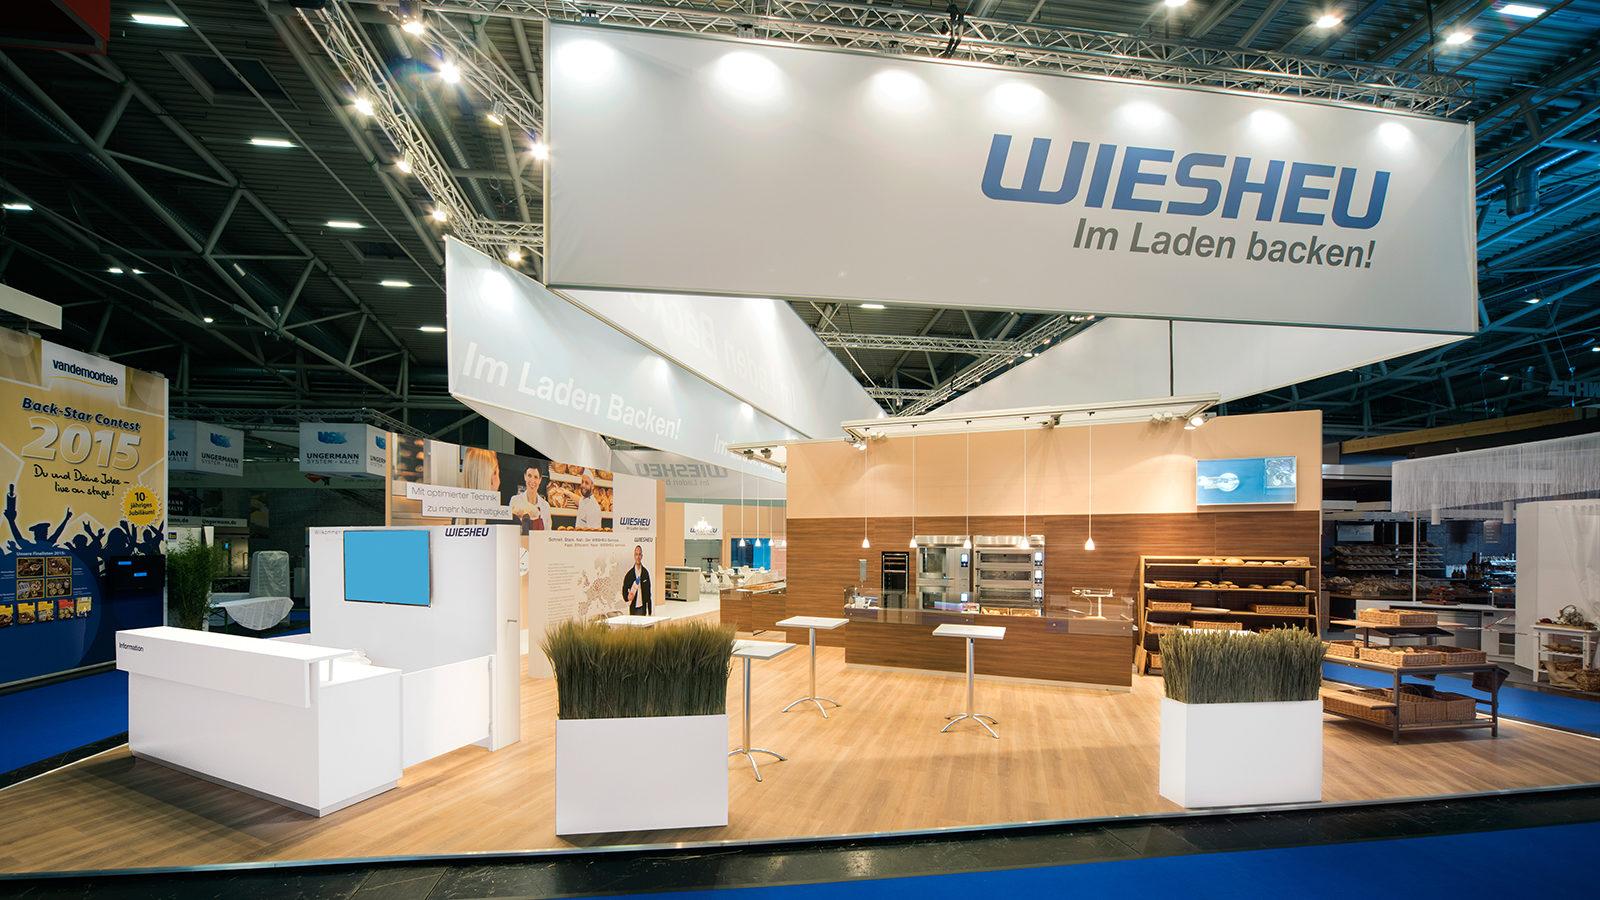 WIESHEU<br>450 m², iba in Stuttgart